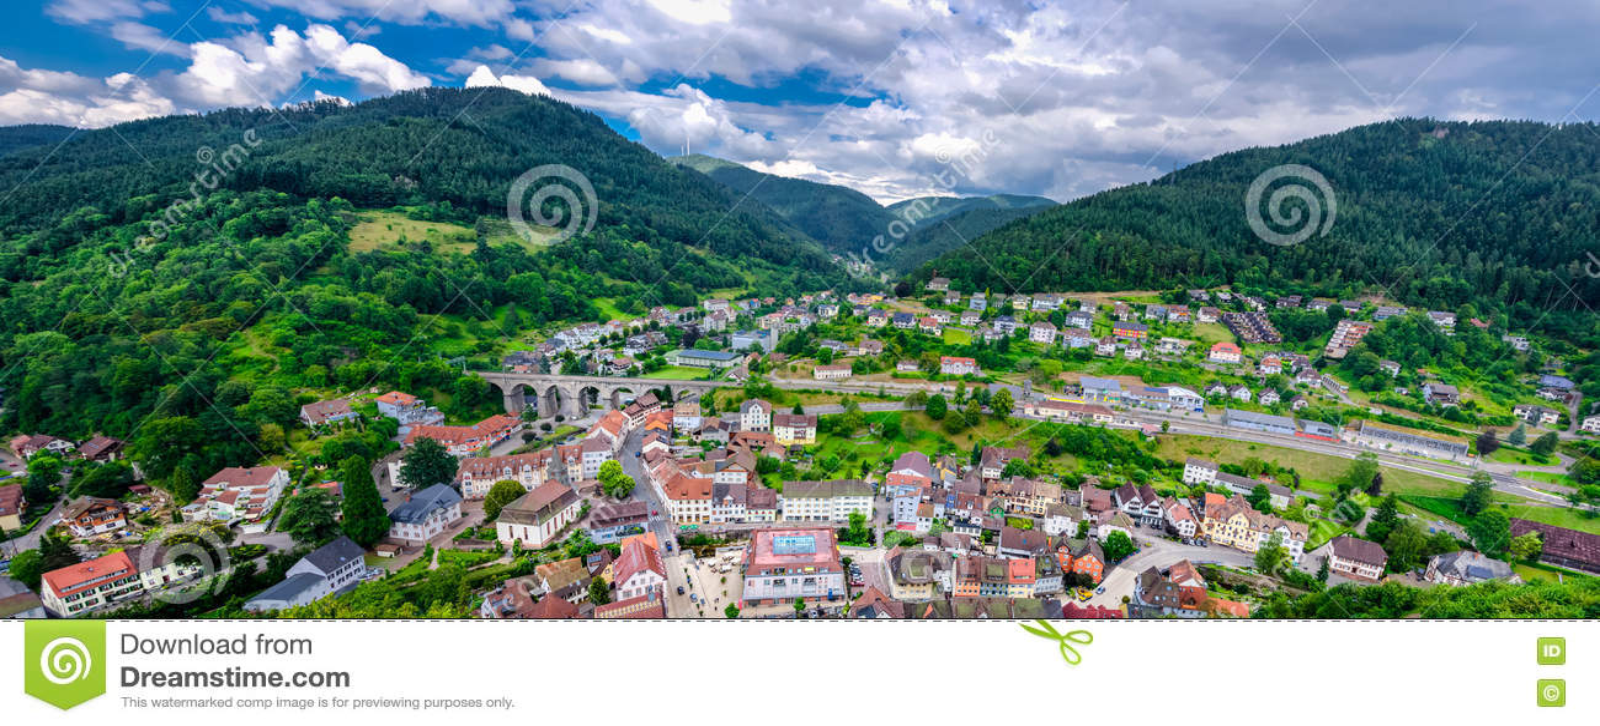 Панорамный взгляд на Hornberg в горах черного леса, земле Бадена Wurttemberg, Германии